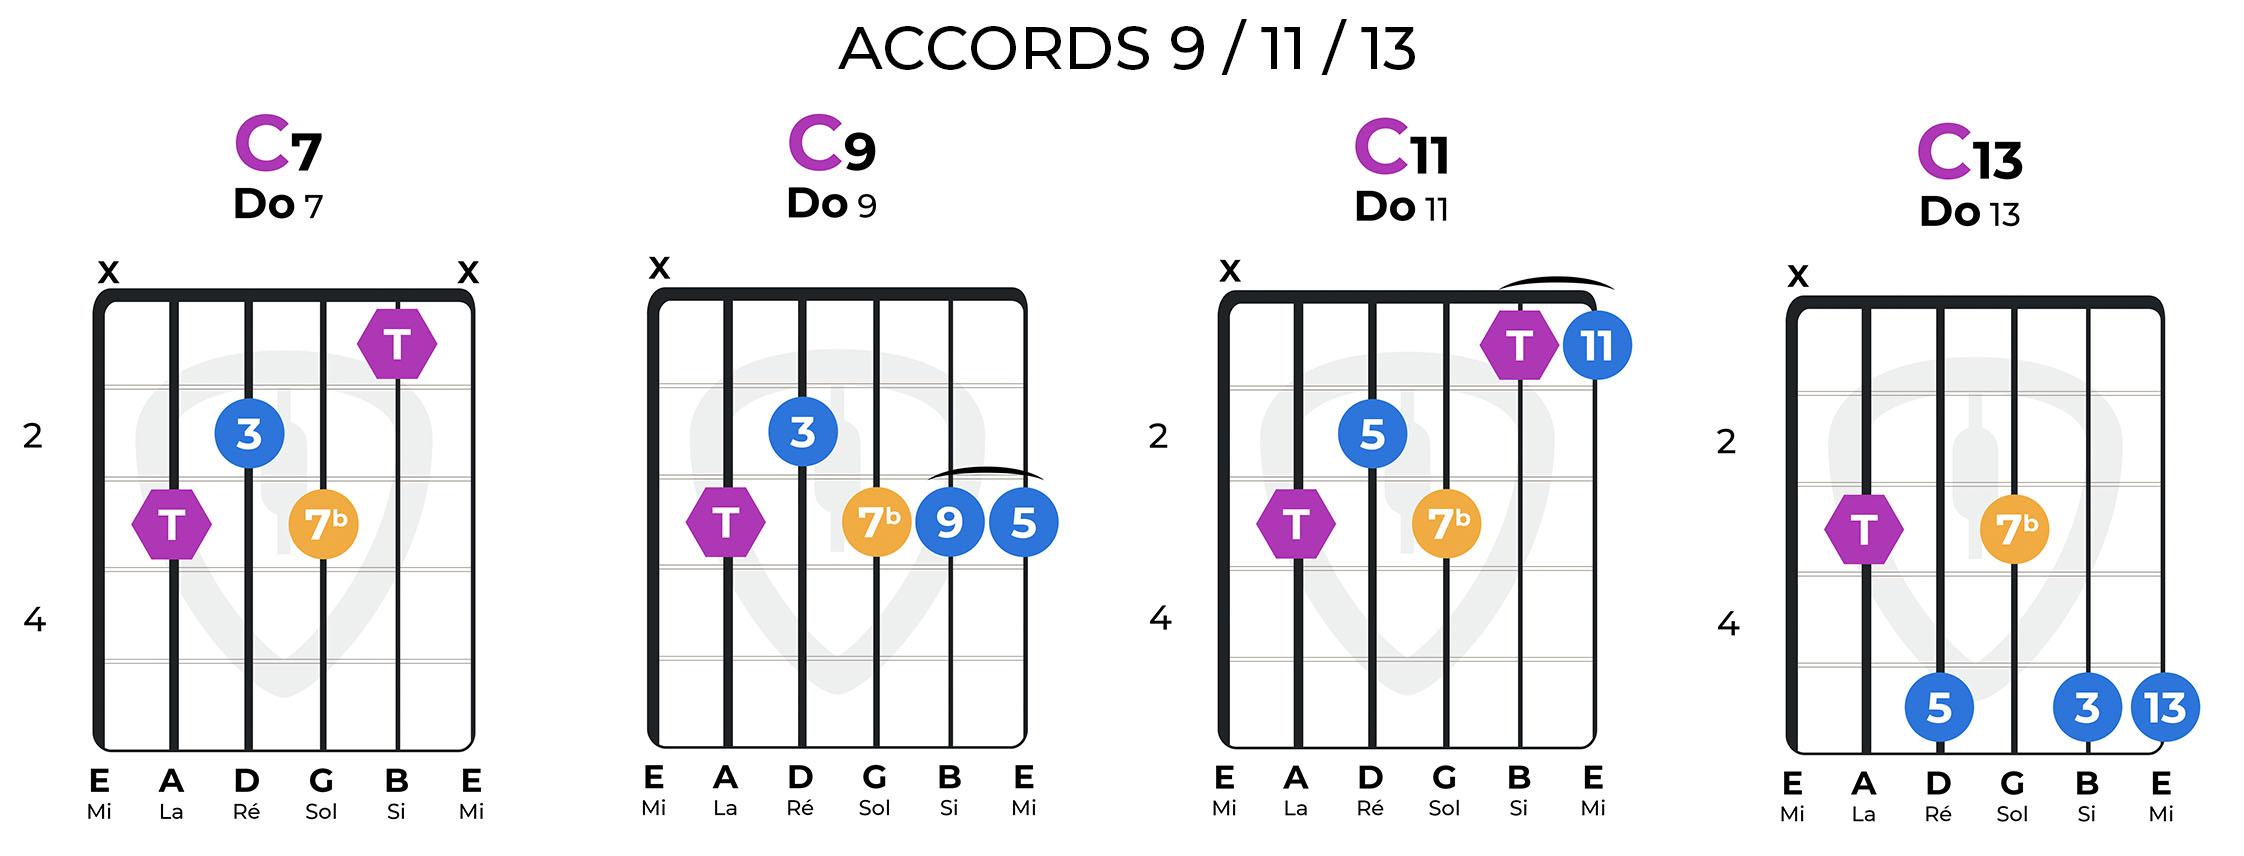 accords 7 9 11 13 guitare accords complexes